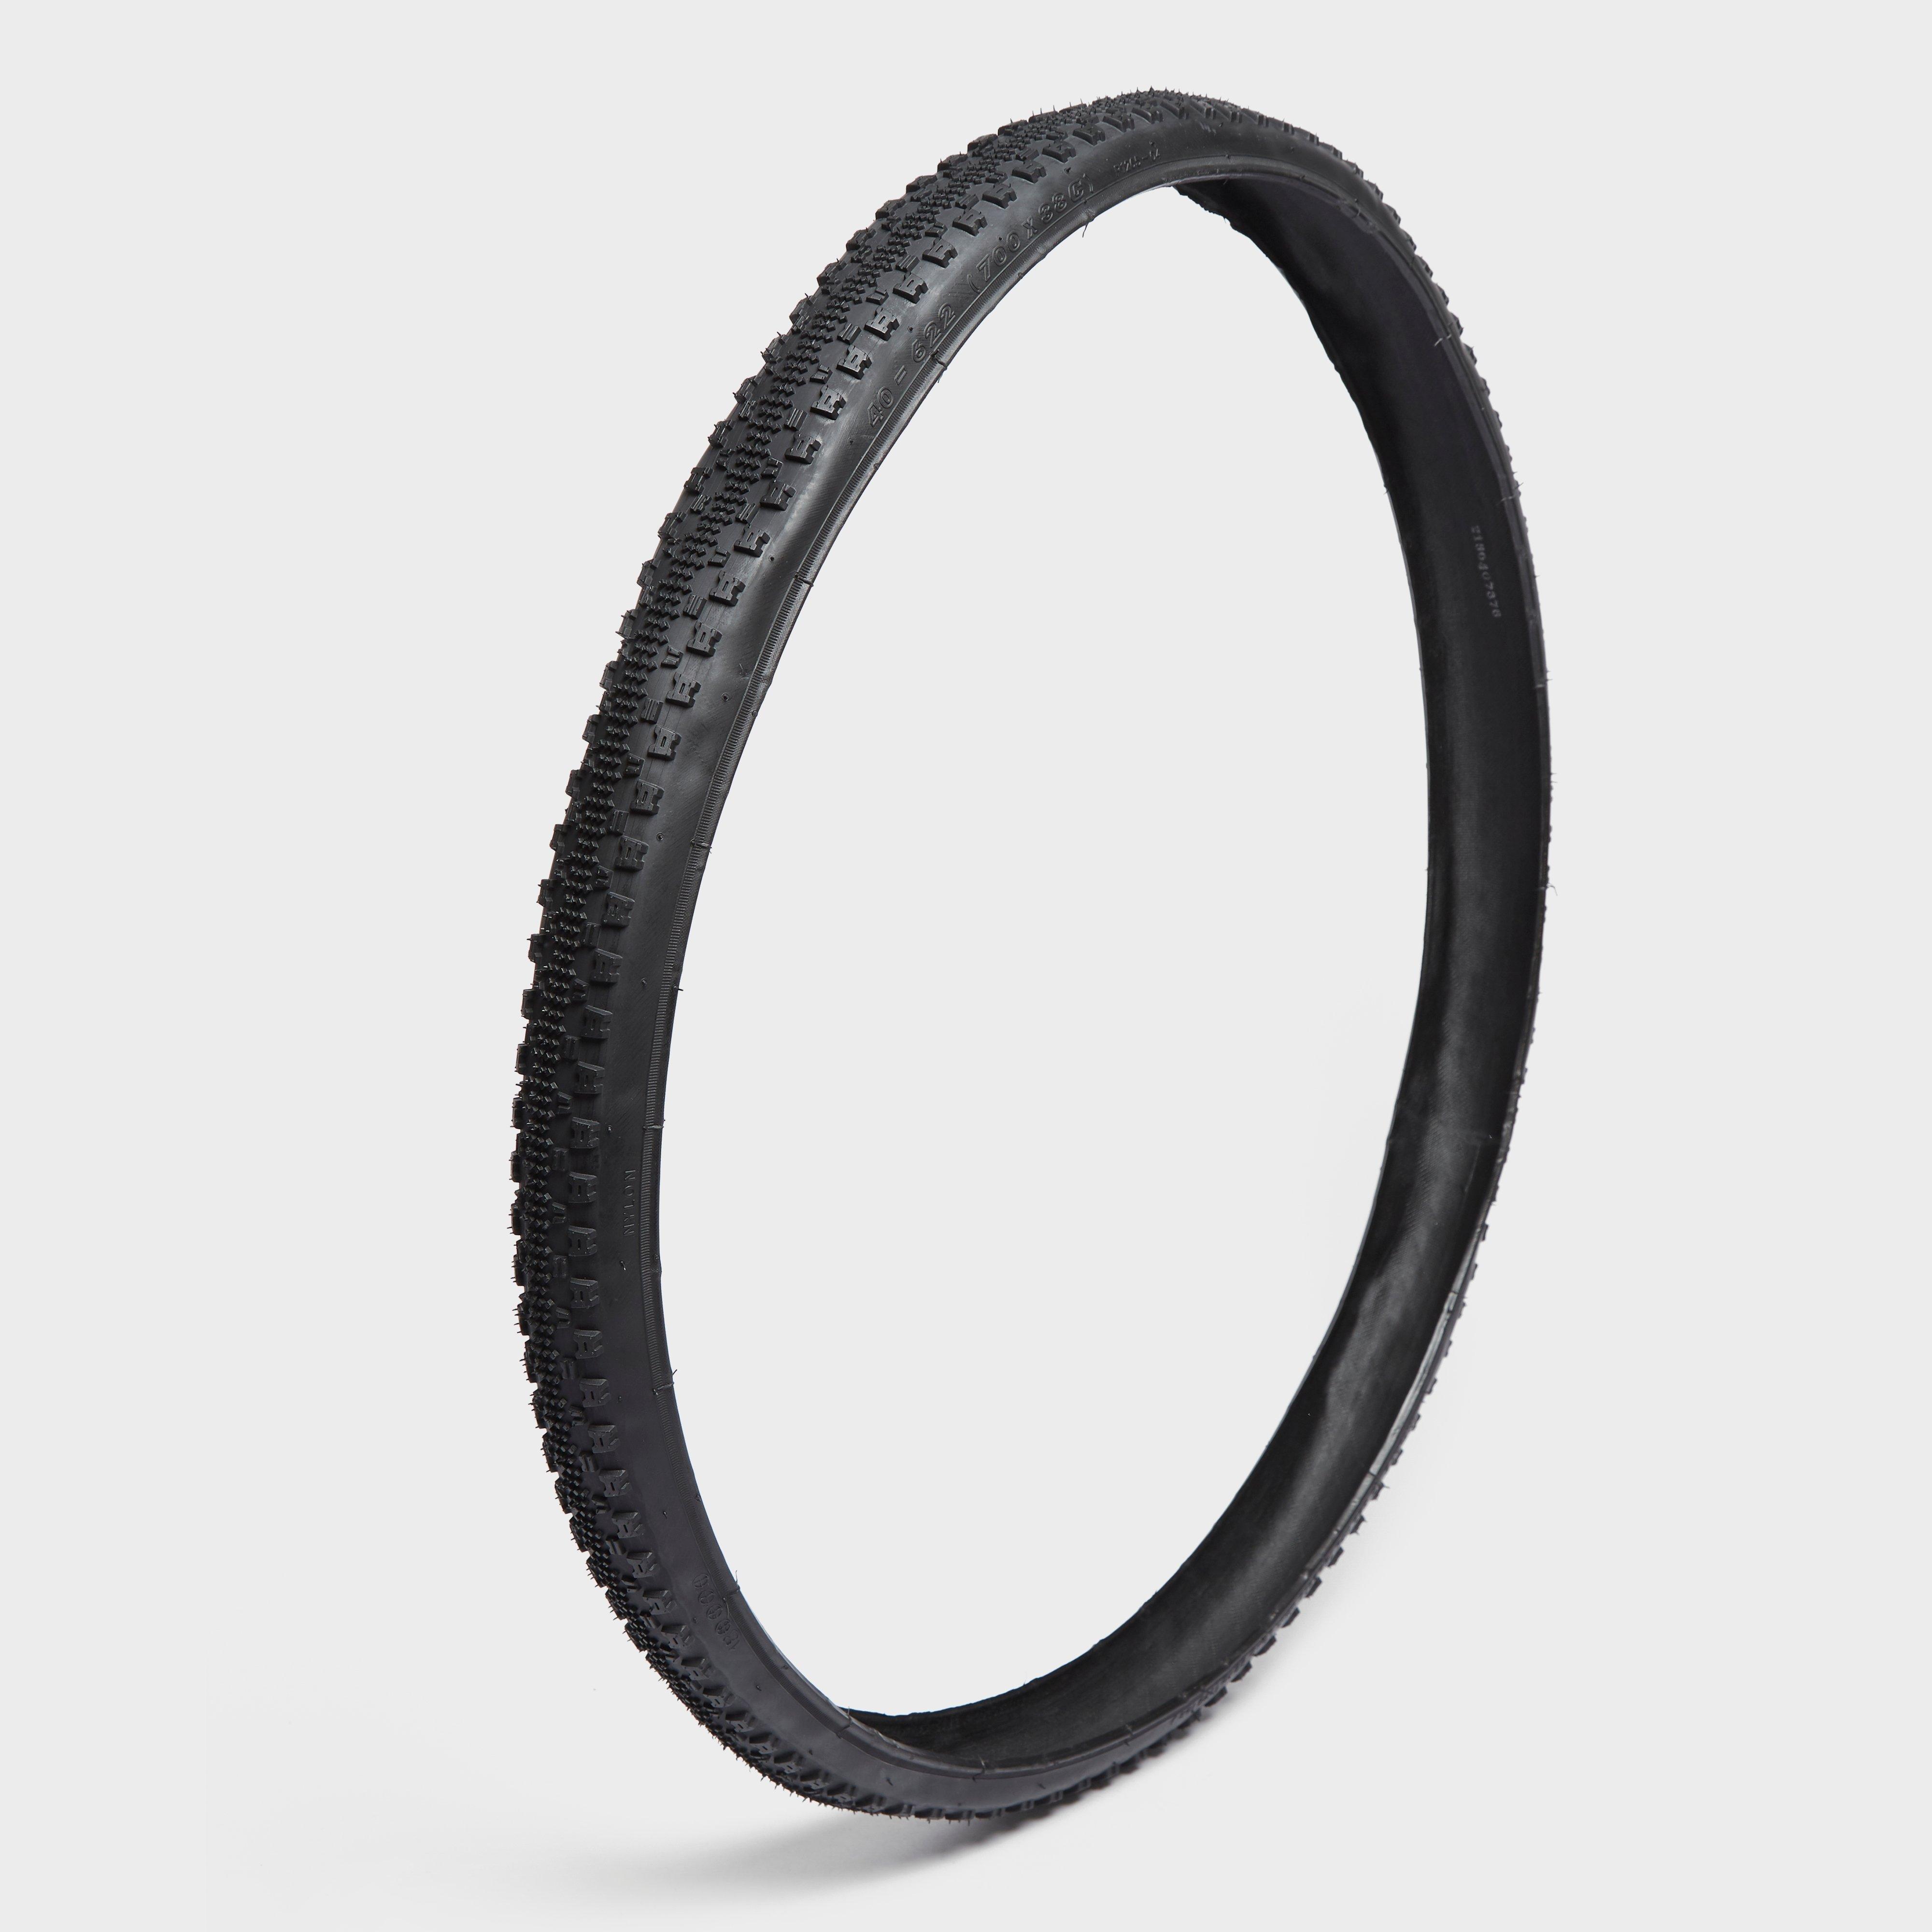 One23 700 X 38 Folding City Bike Tyre - Black/city  Black/city